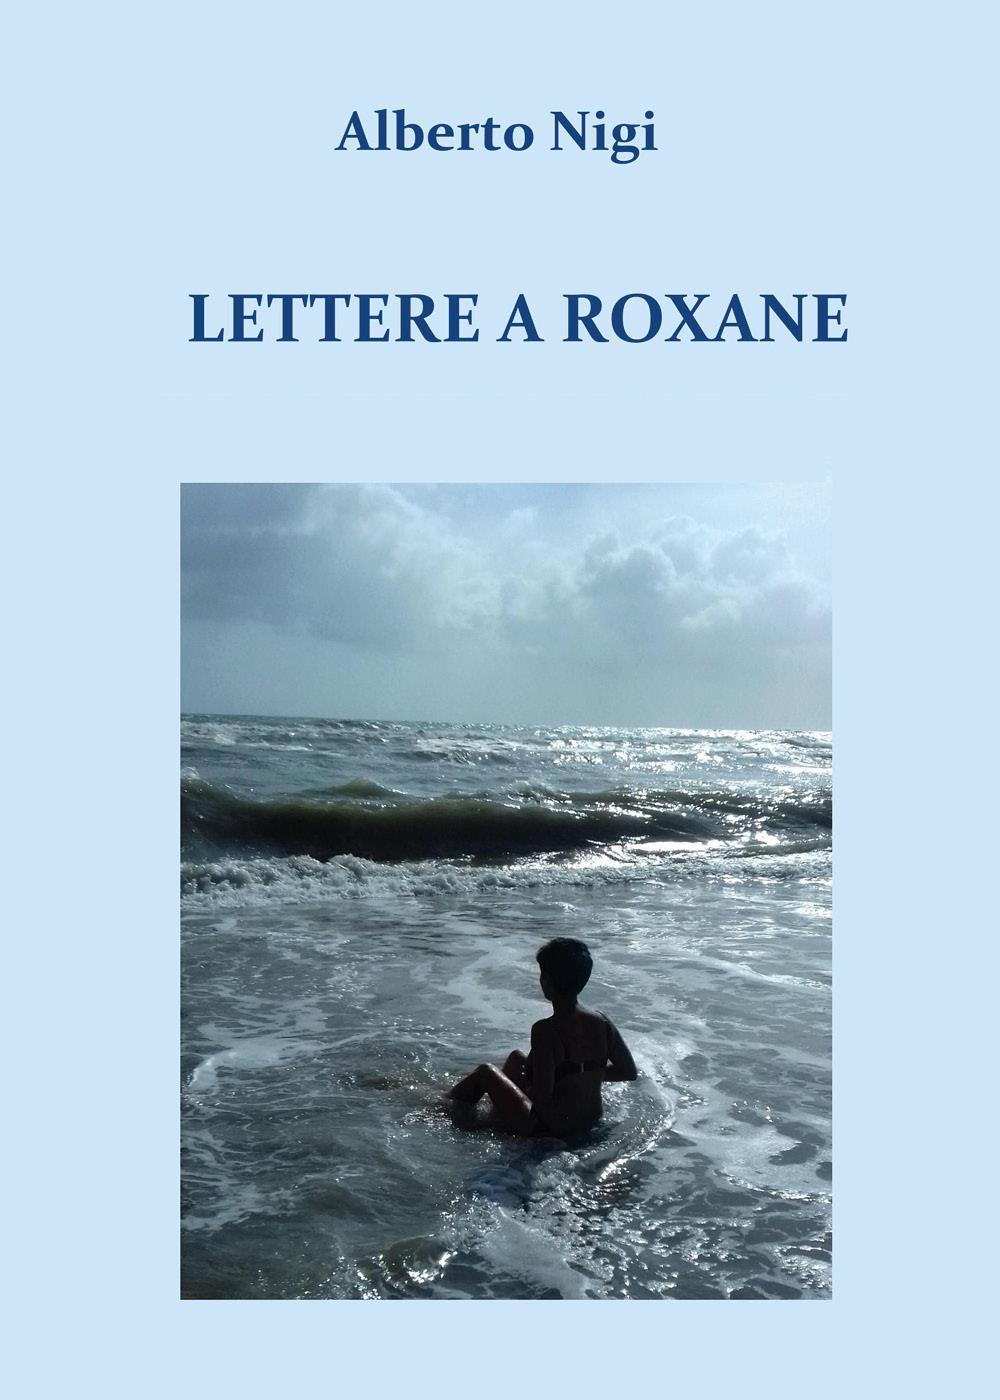 Lettere a Roxane